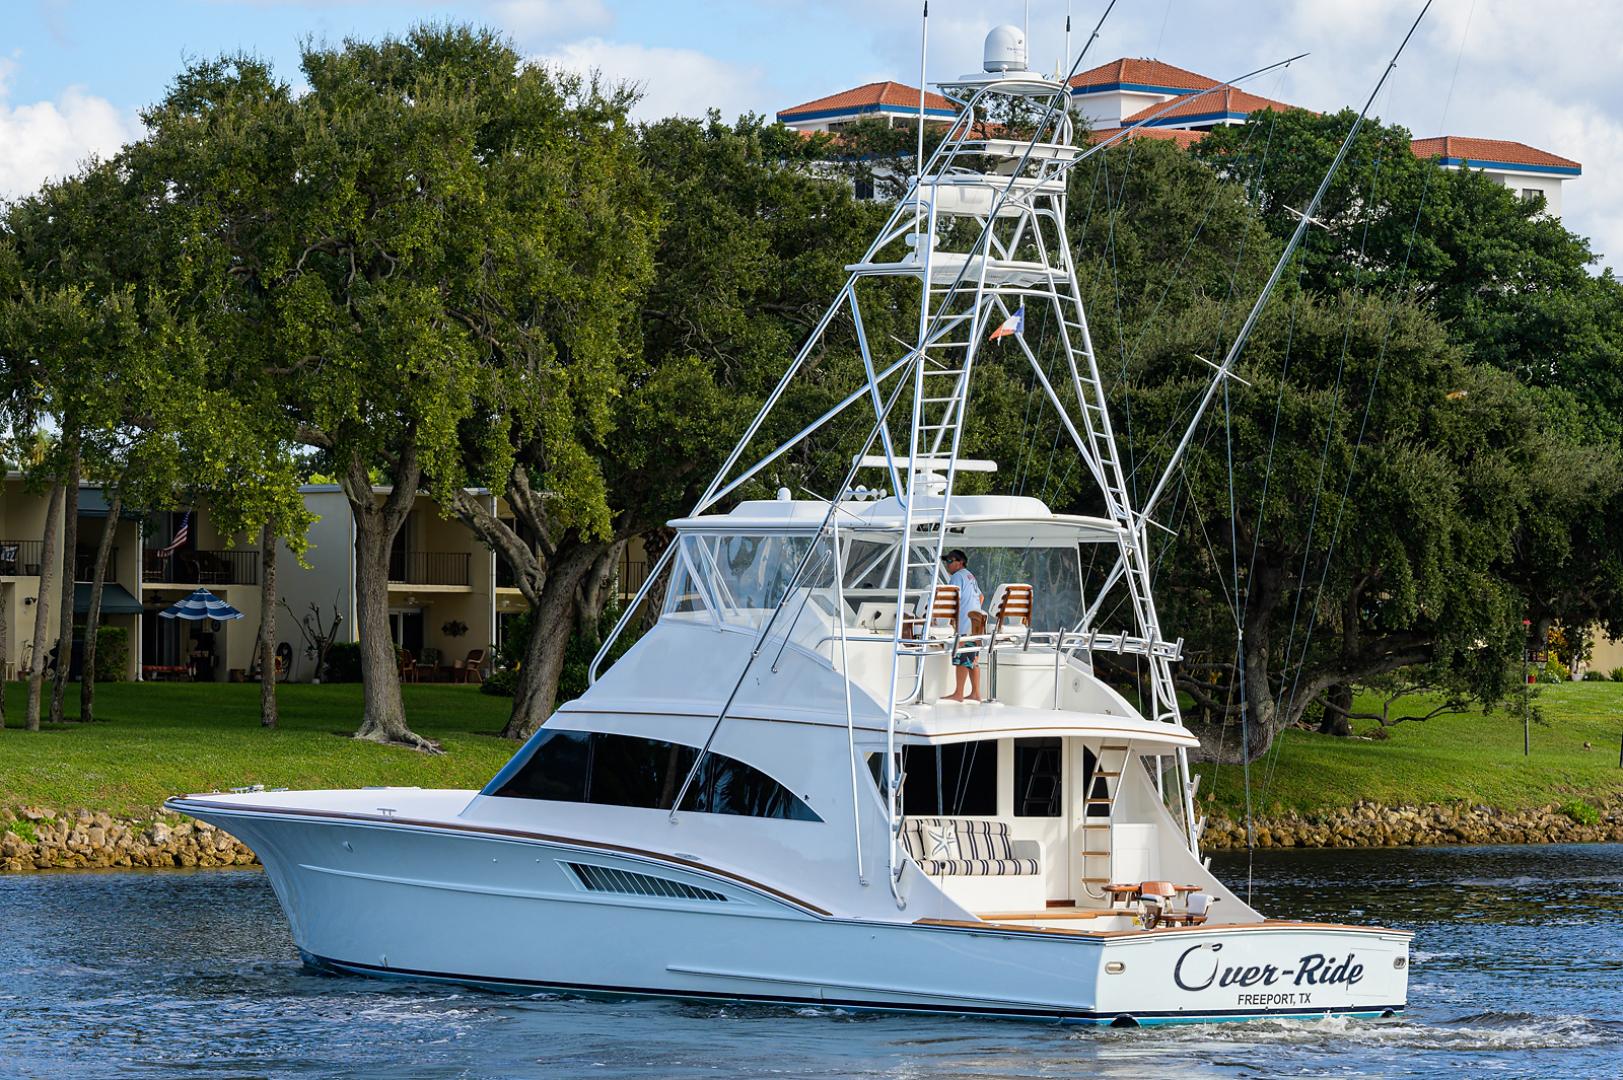 Titan-Convertible 2015-OVER RIDE PALM BEACH GARDENS-Florida-United States-OVER-RIDE-1562379 | Thumbnail